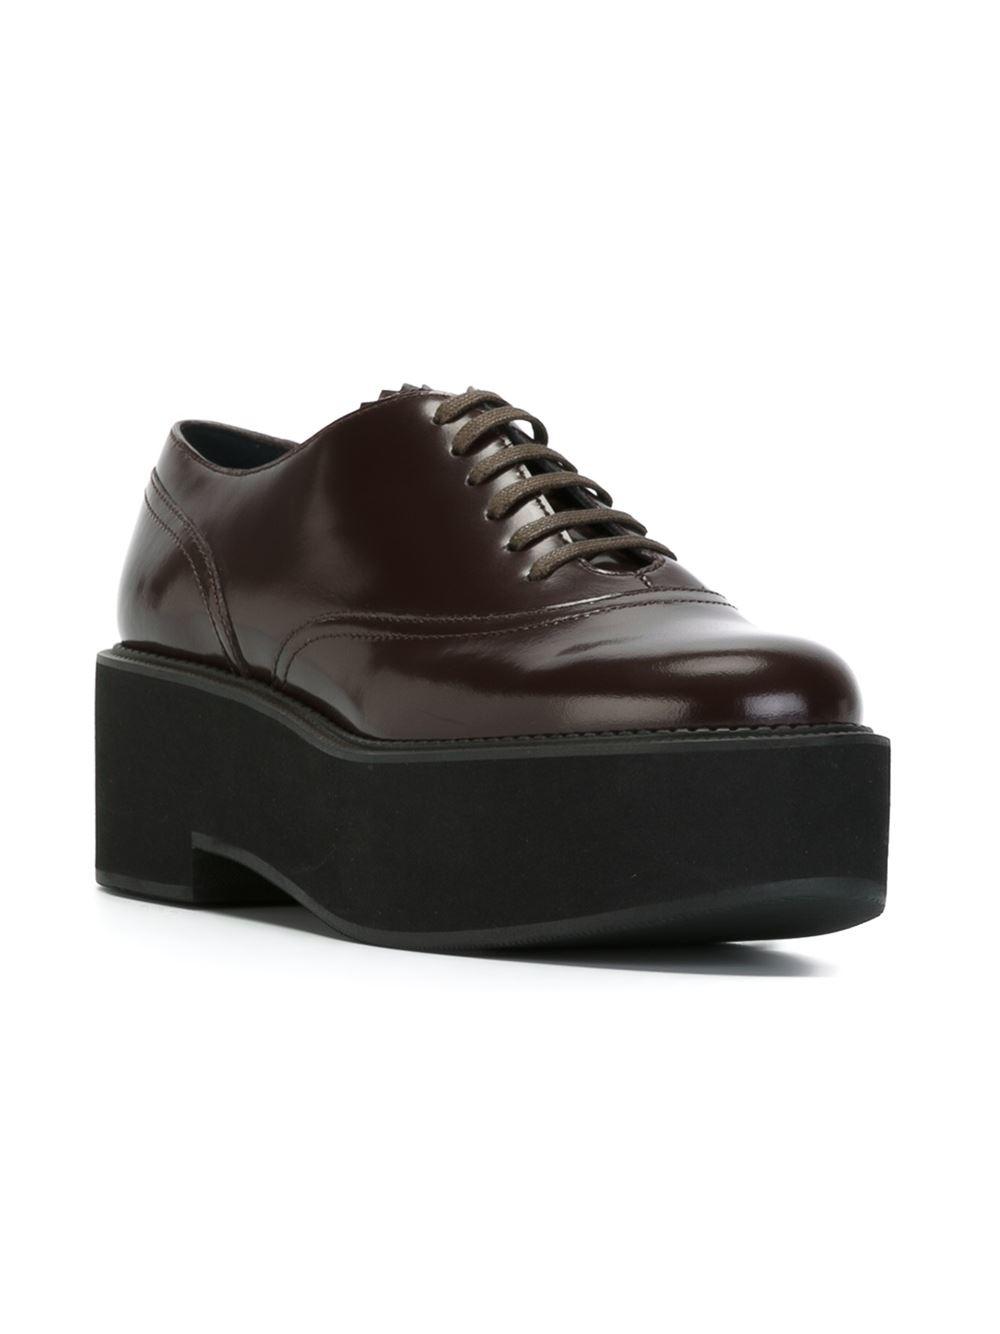 Jil Sander Navy Platform Lace Up Shoes In Brown Lyst